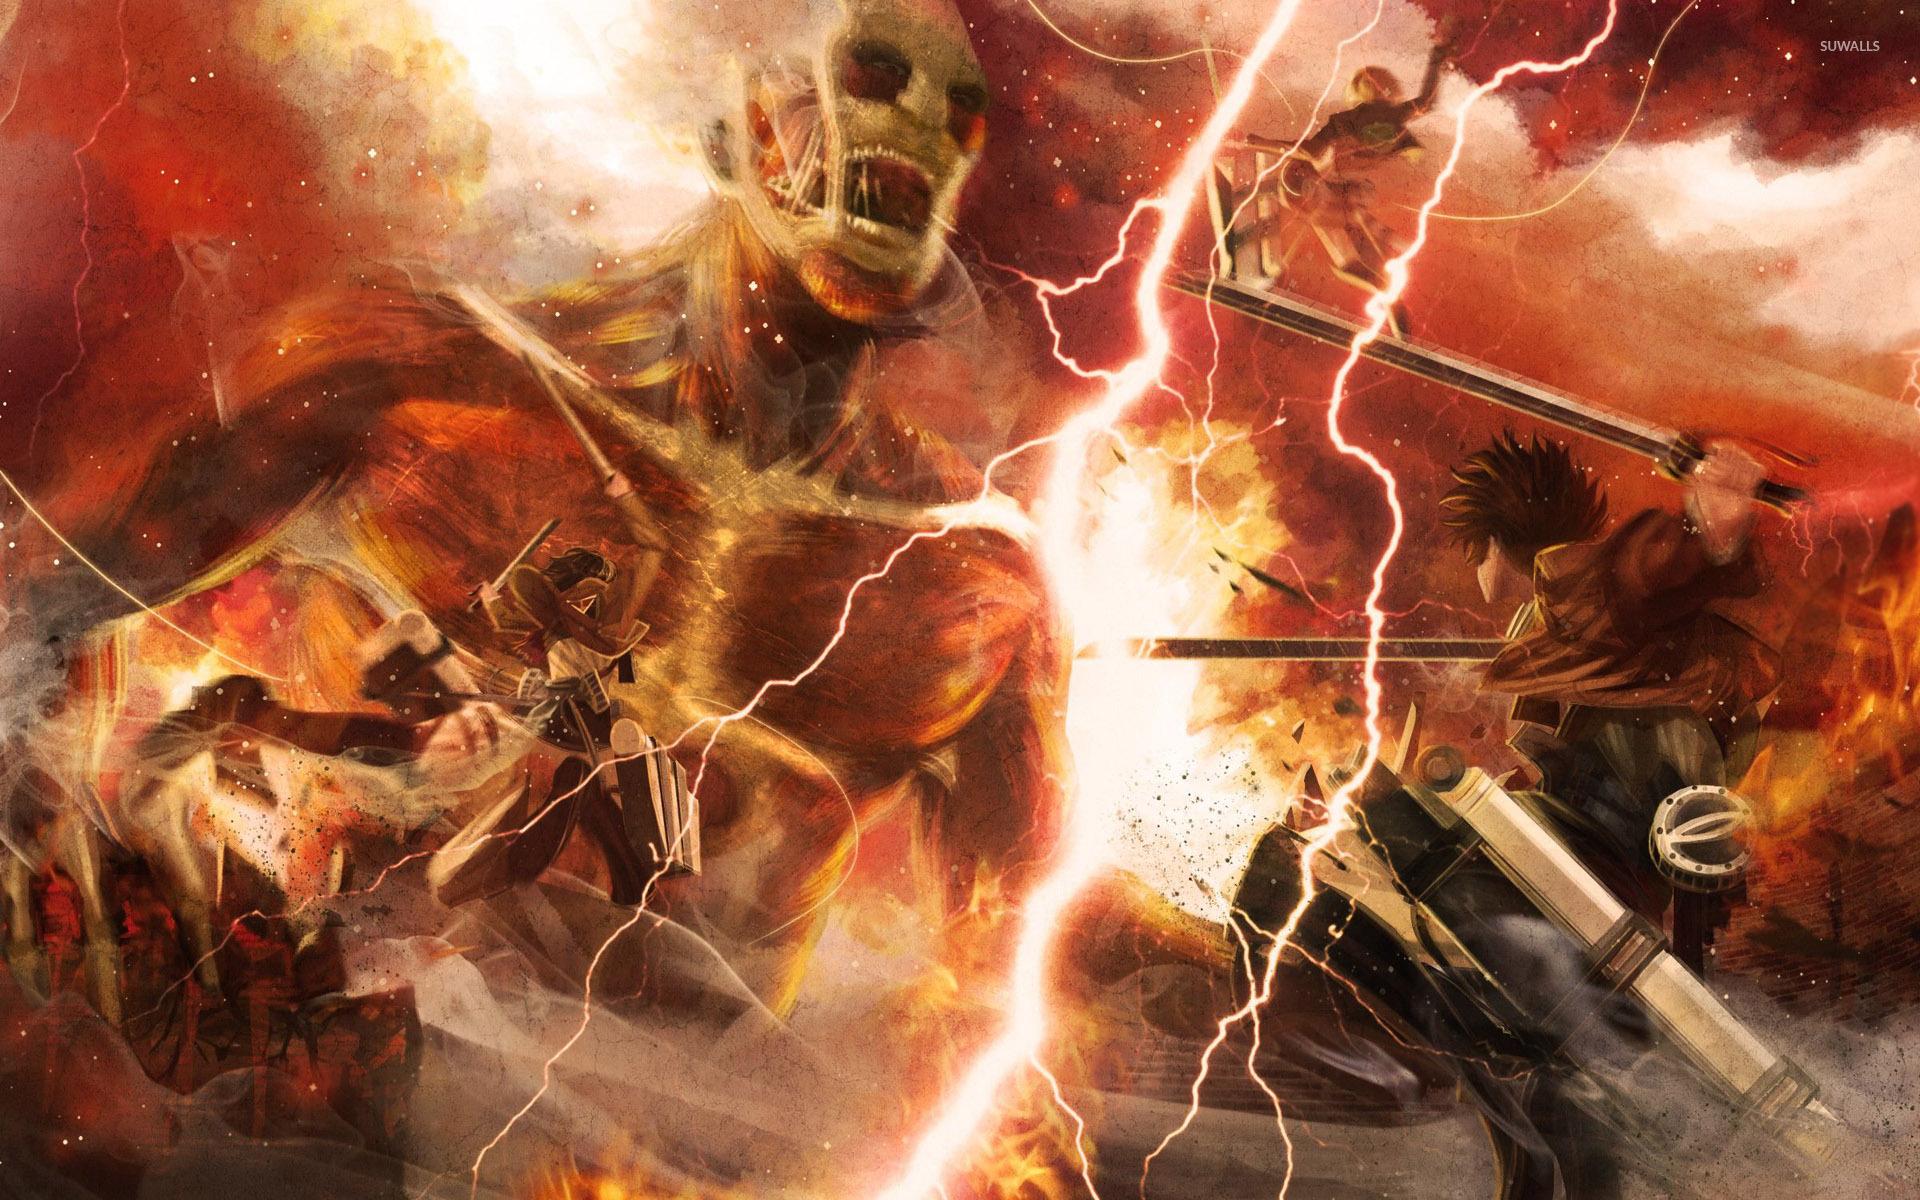 Free Download Attack On Titan Wallpaper 1366x768 1366x768